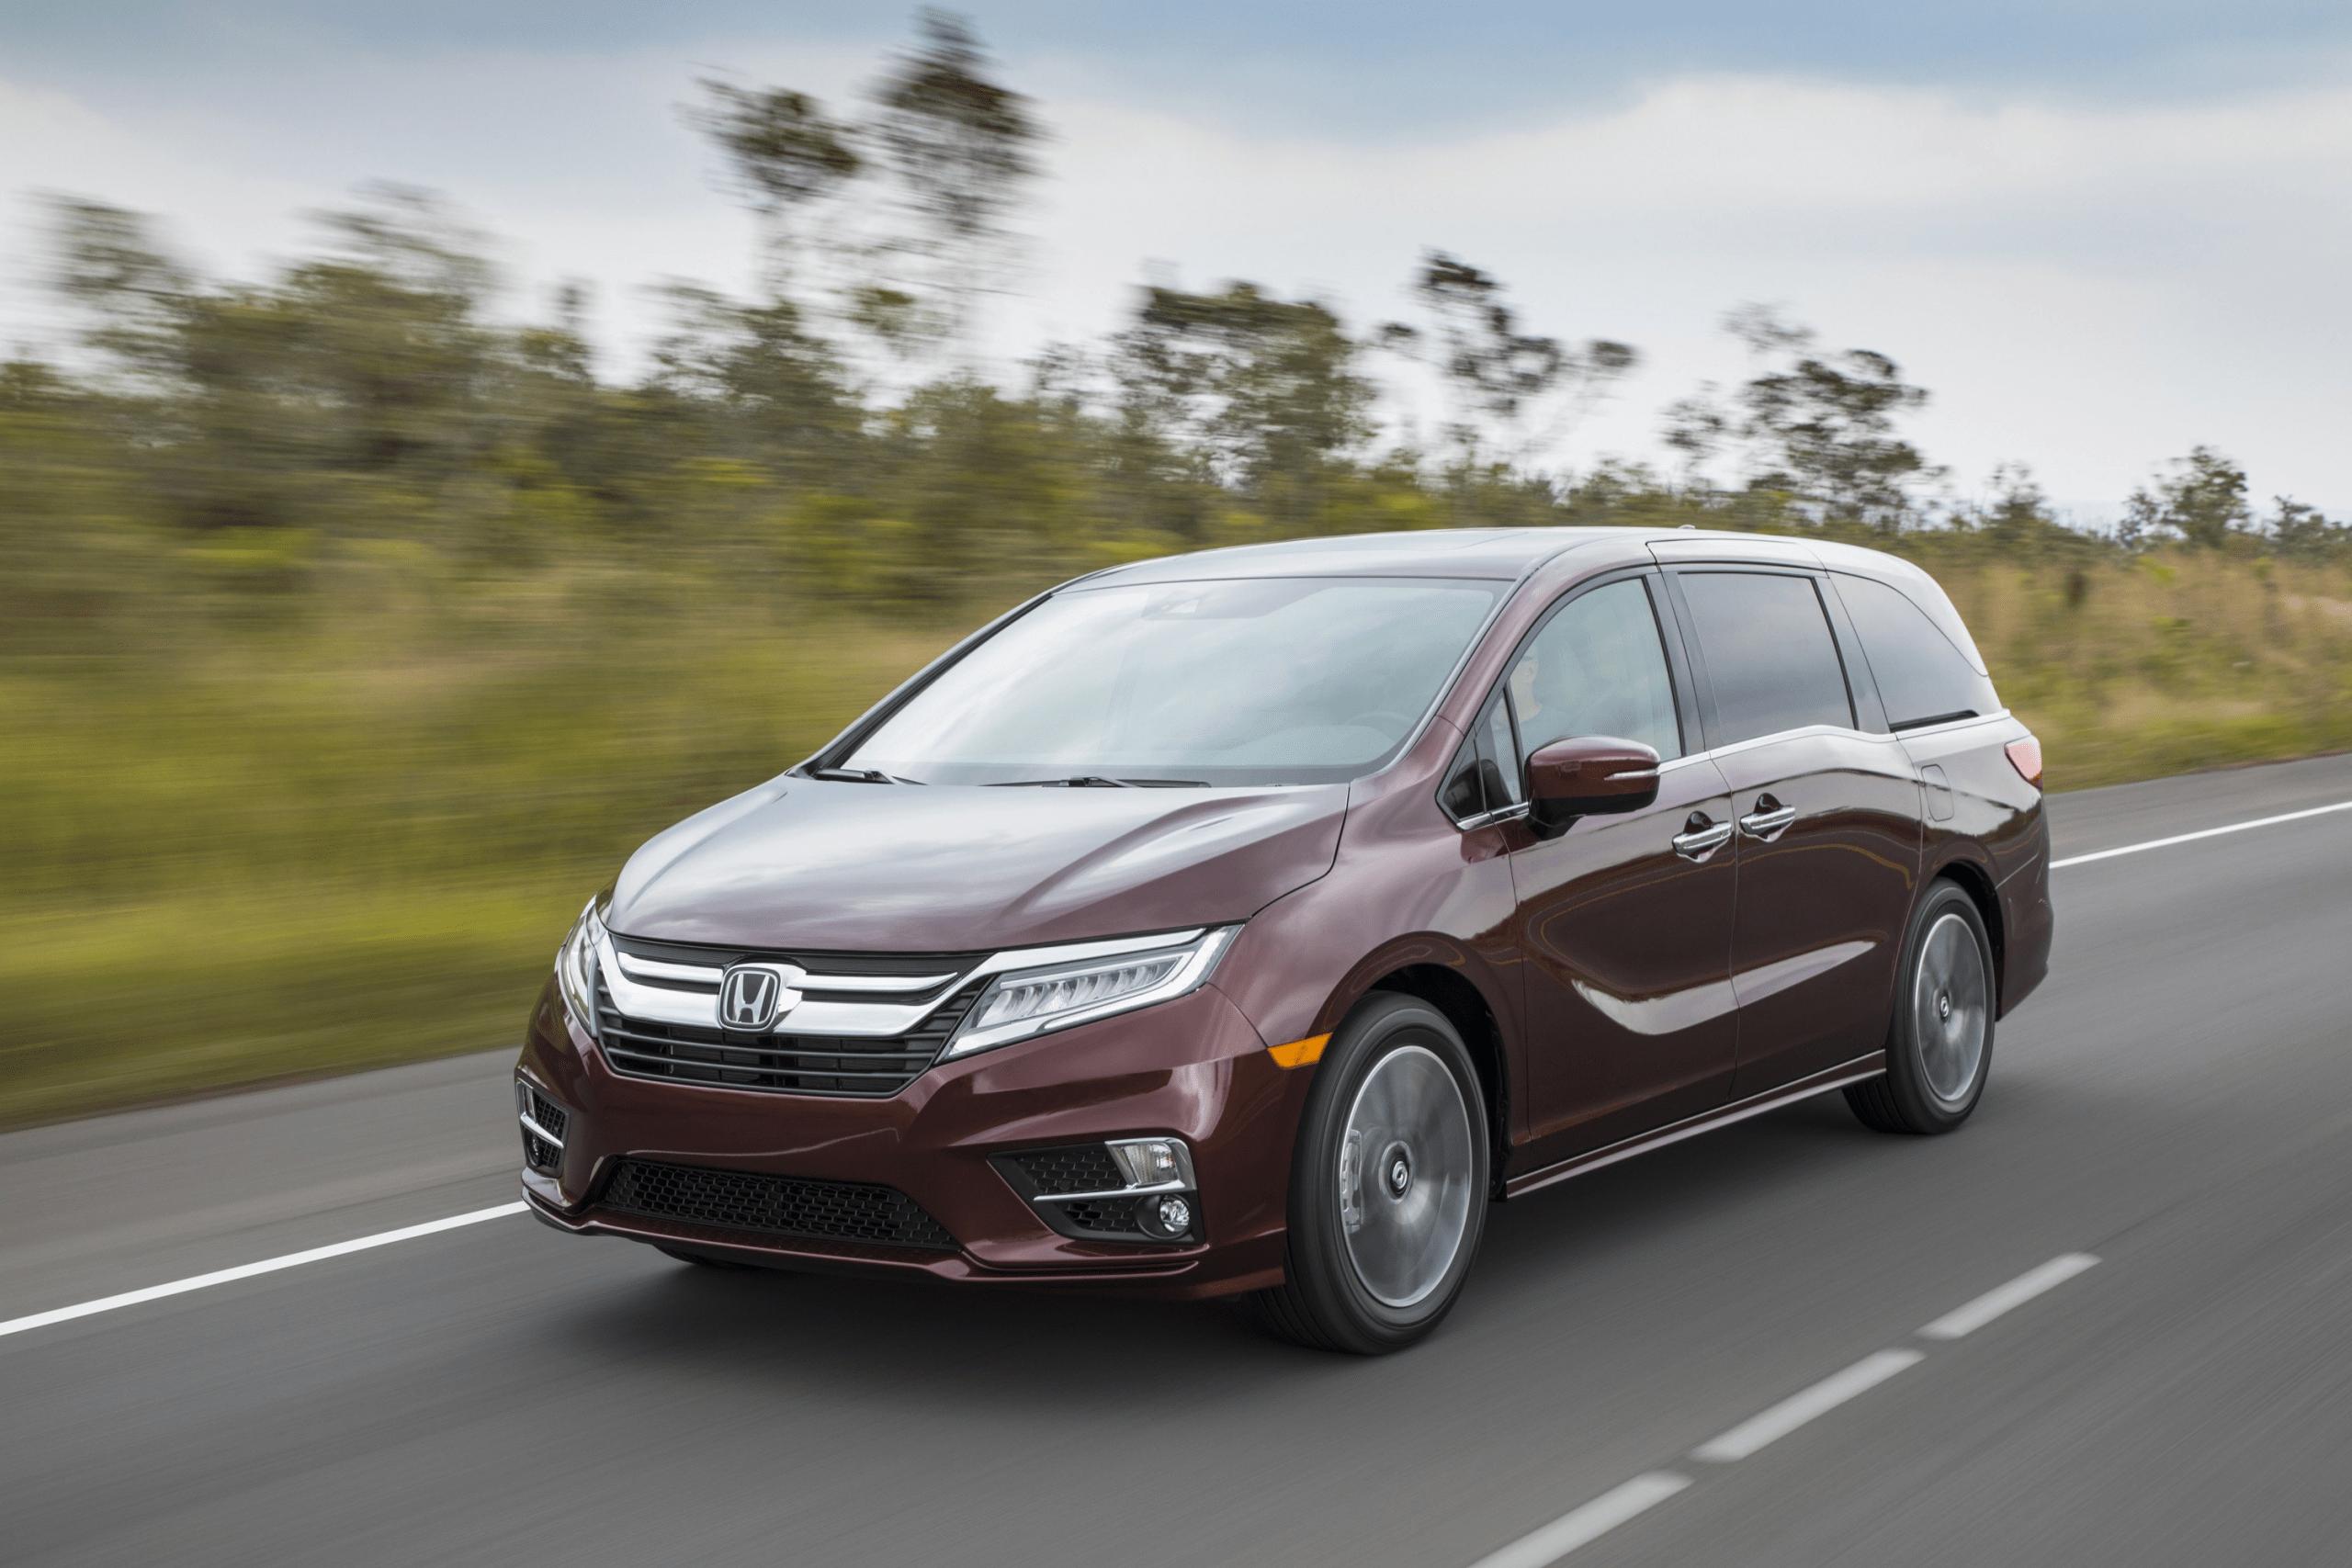 2021 Honda Odyssey Specs In 2020 Honda Odyssey Honda Odyssey Reviews Honda